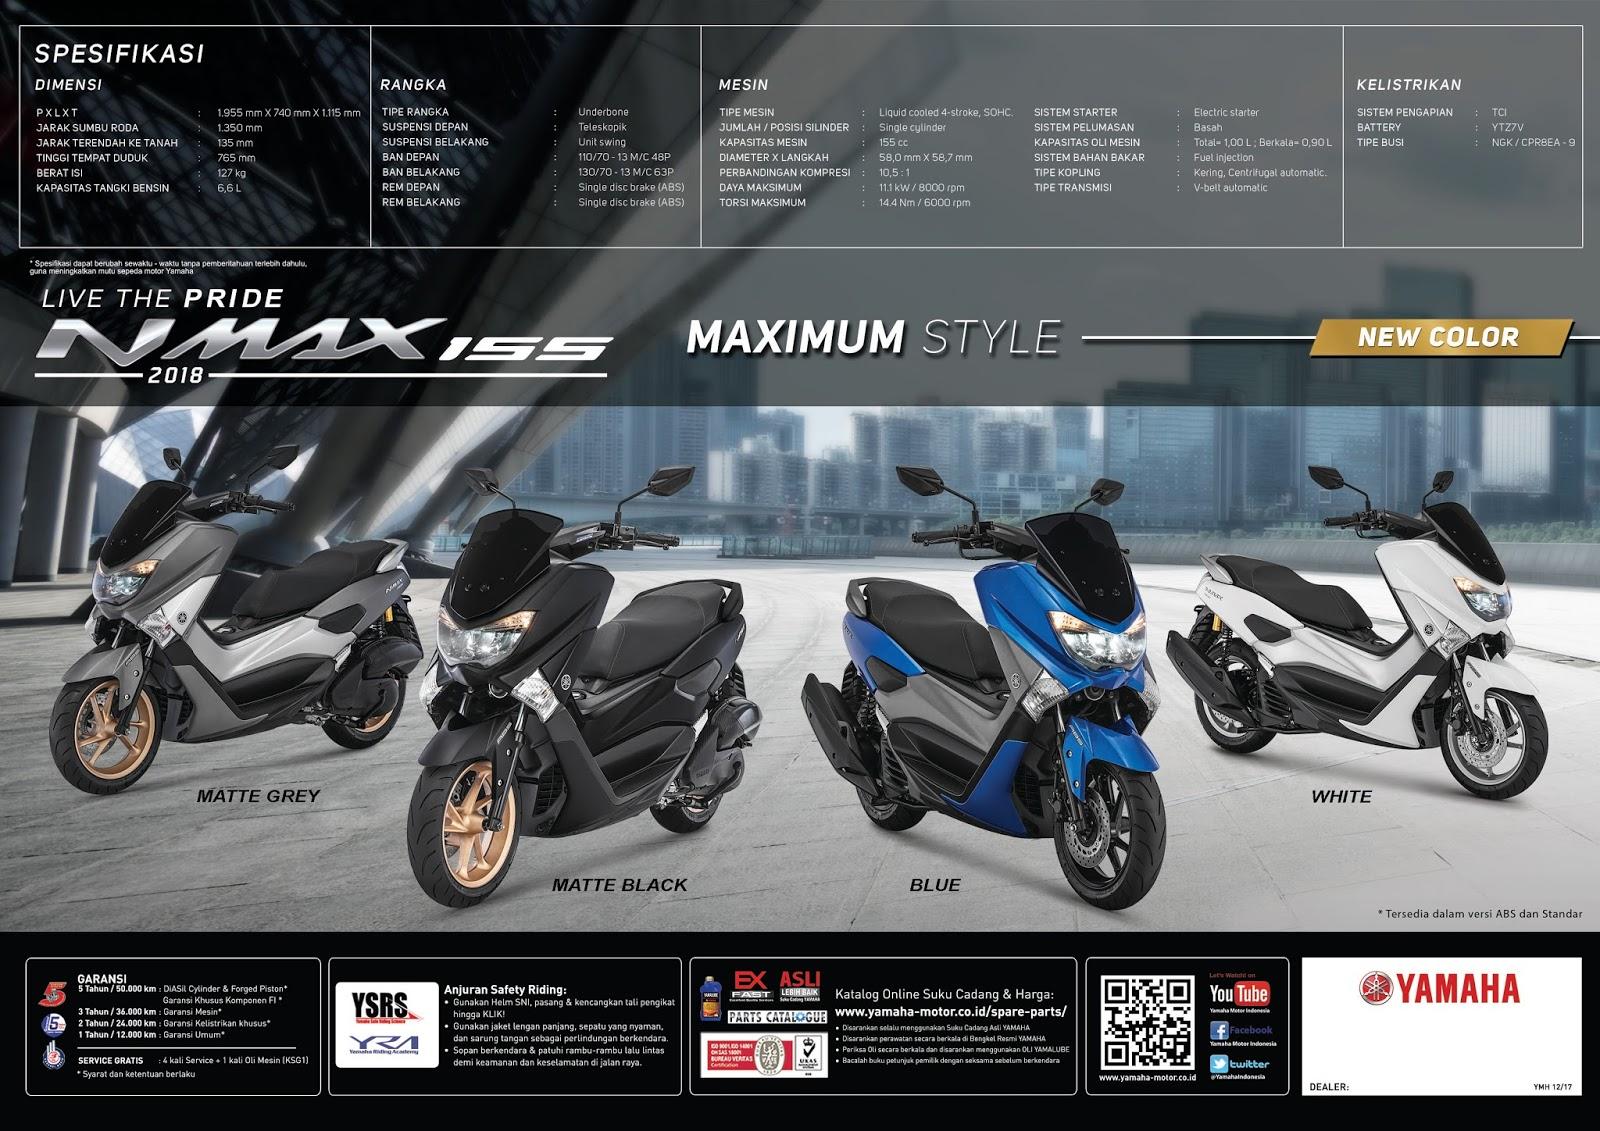 Nmax 2018 Harga Medan 4 Warna Baru Yamaha 2017 Facelift Kaos N Max Motor Lengan Panjang By Launching 155 Di Pontianak Live The